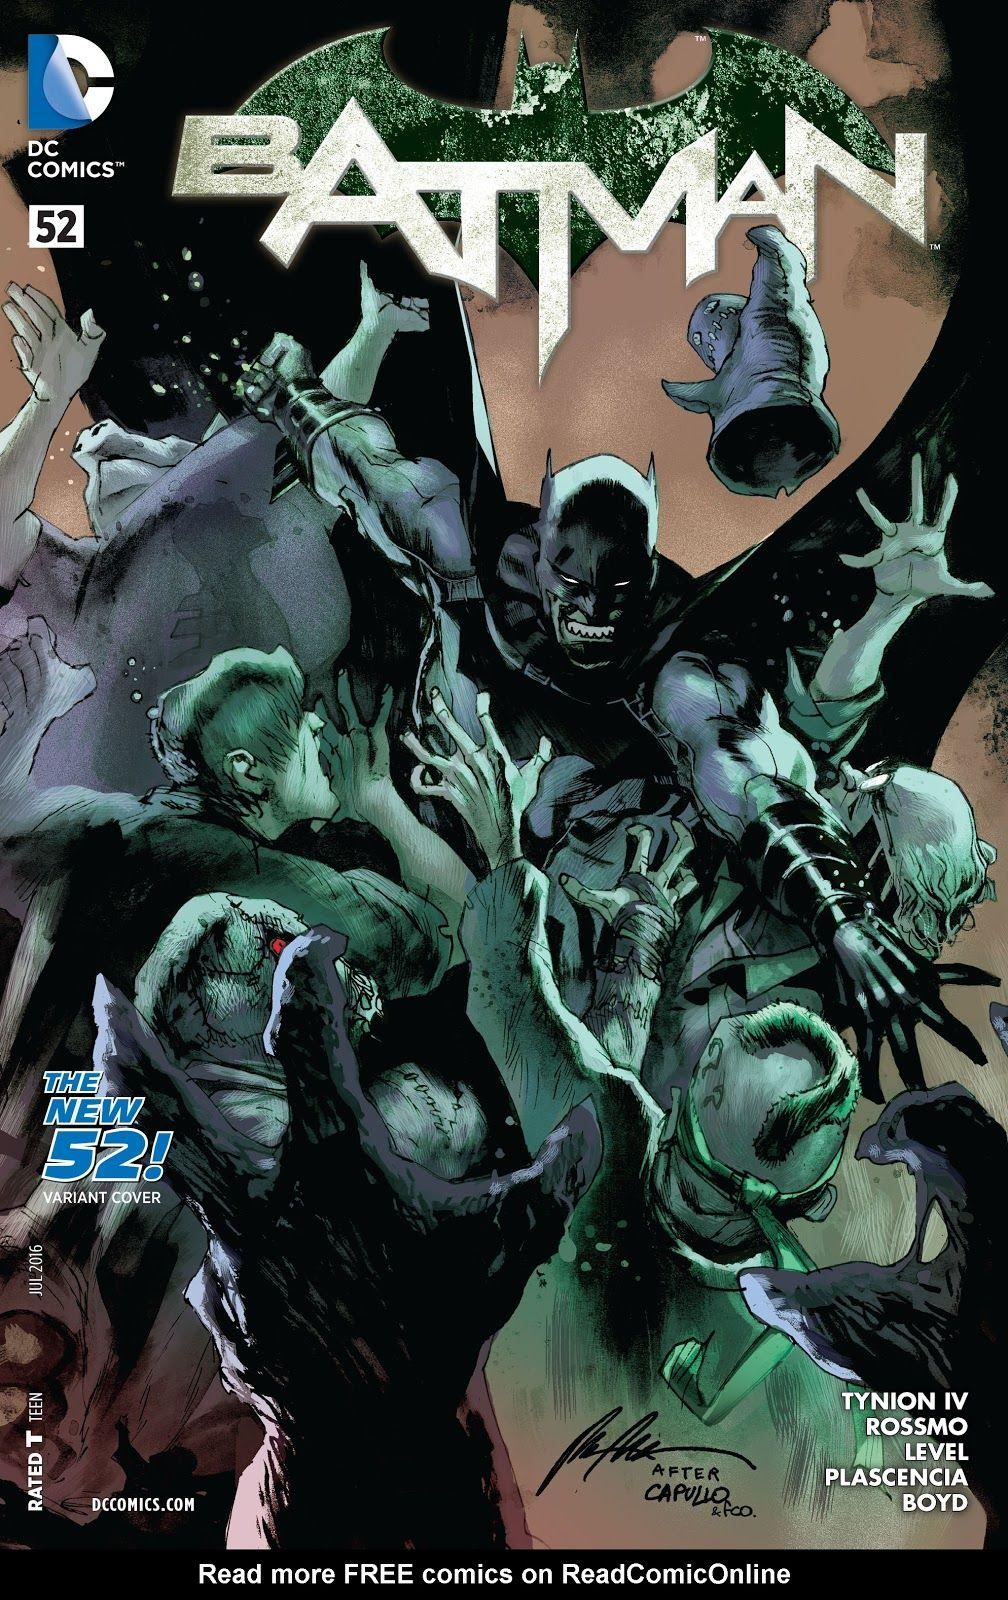 Batman (2011) Issue #52 by Rafael Albuquerque